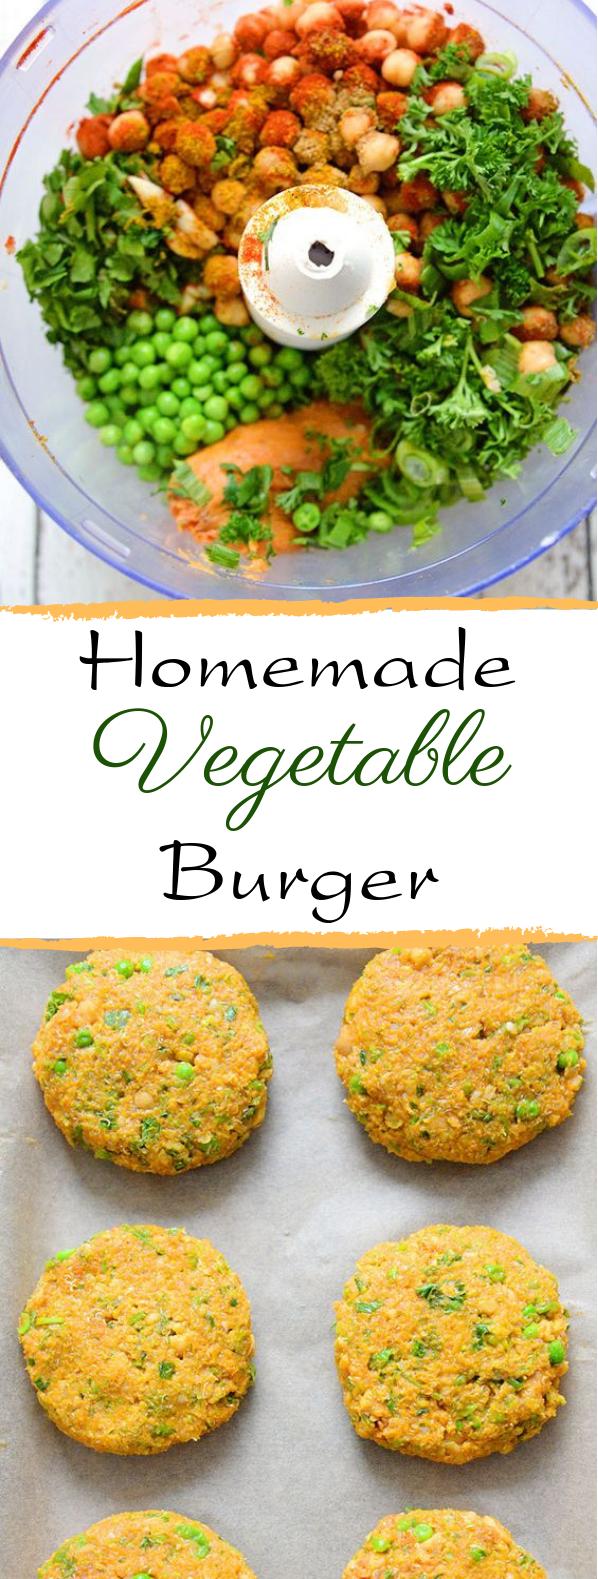 Homemade Veggie Burger #burger #vegetarian